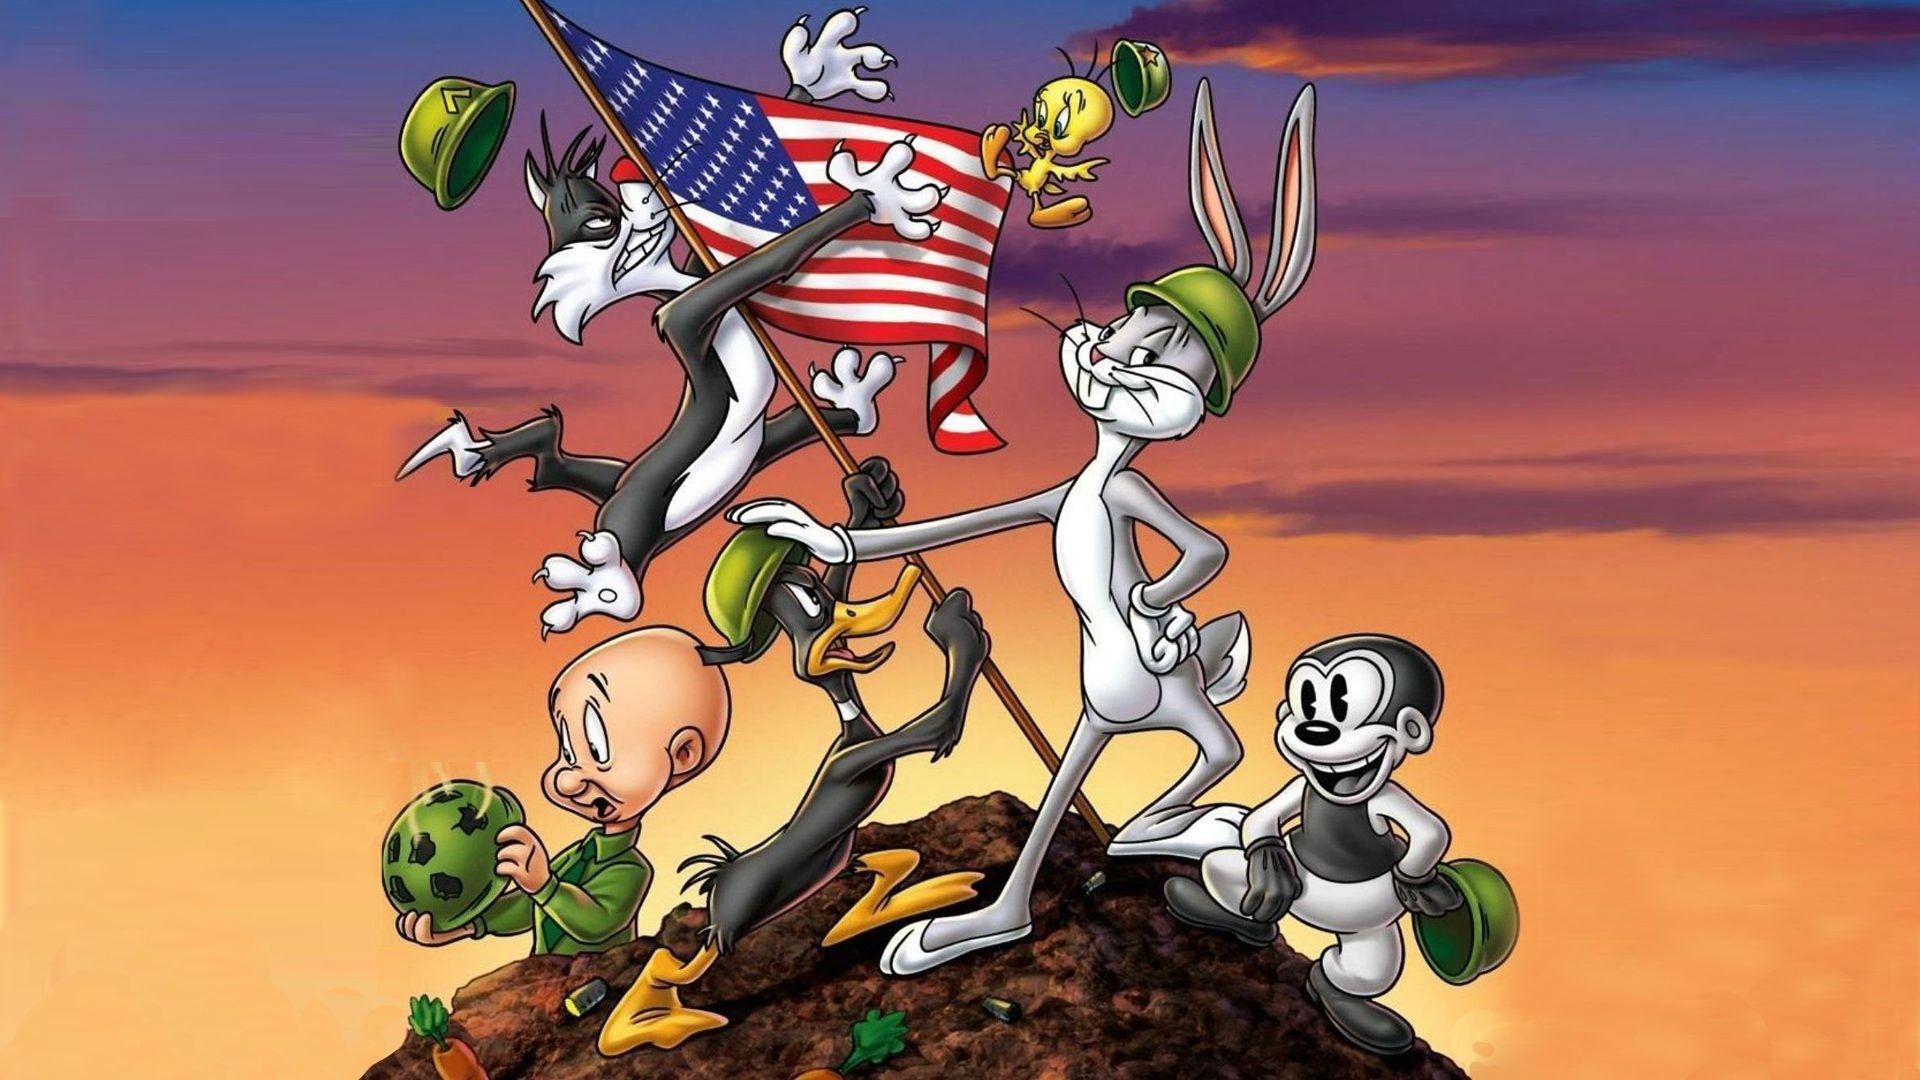 Looney Tunes Background Wallpaper